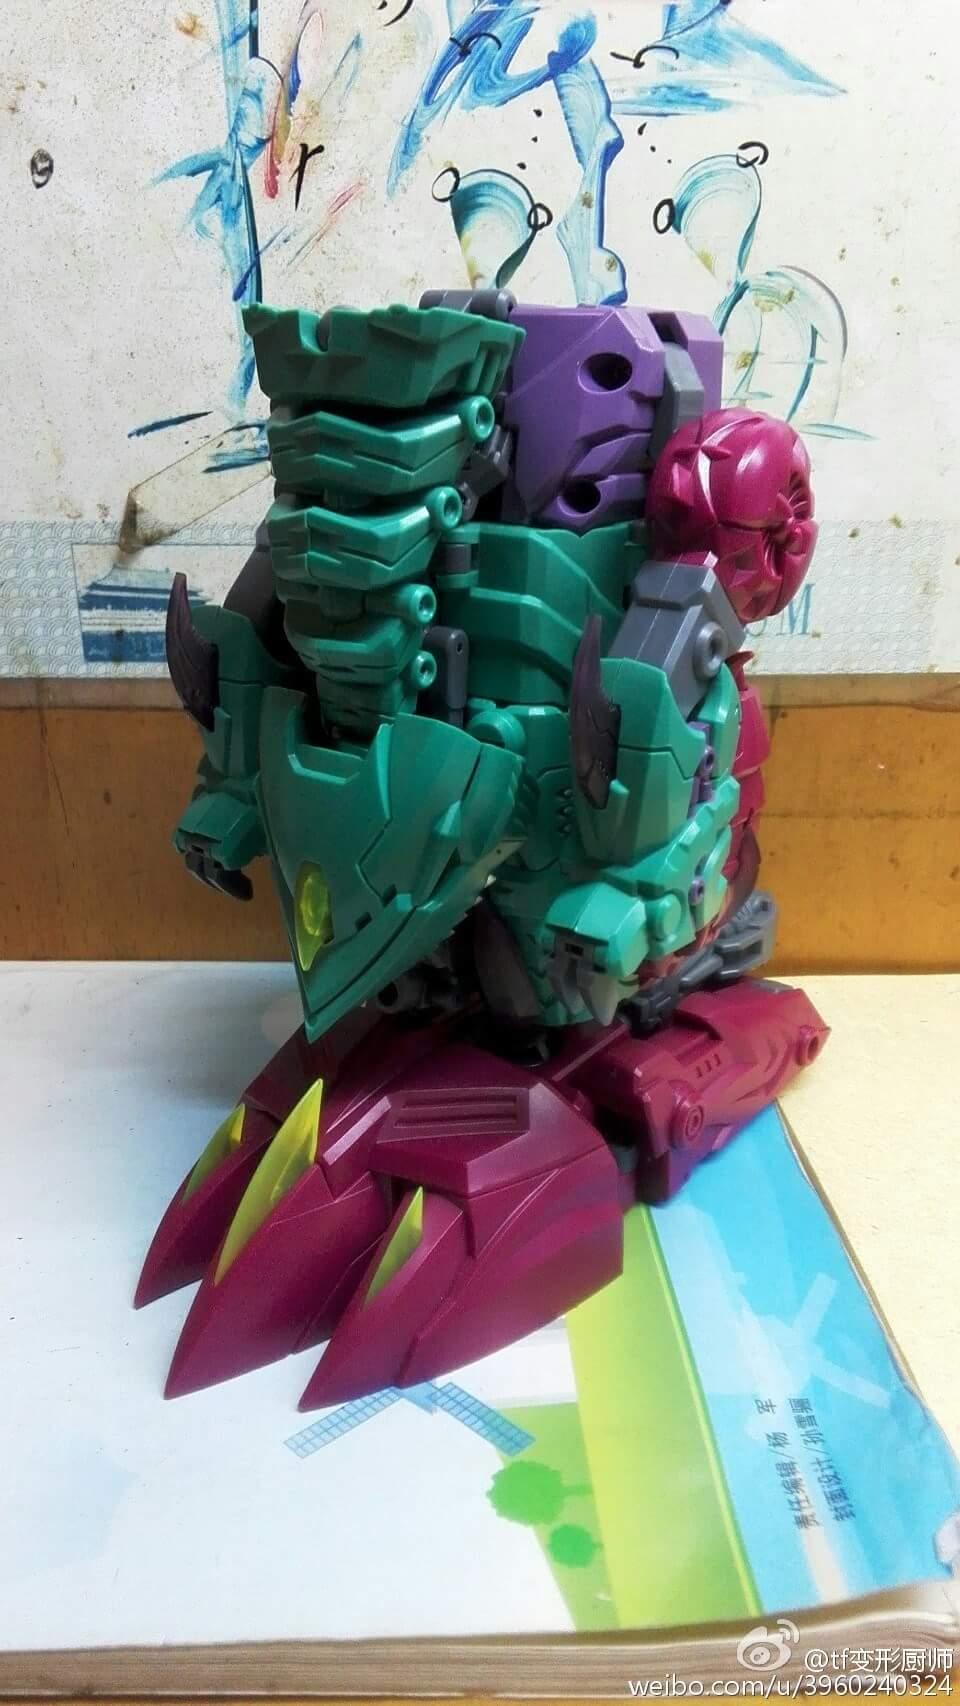 [TFC Toys] Produit Tiers - Jouet Poseidon - aka Piranacon/King Poseidon (TF Masterforce) - Page 3 GeRioCQn